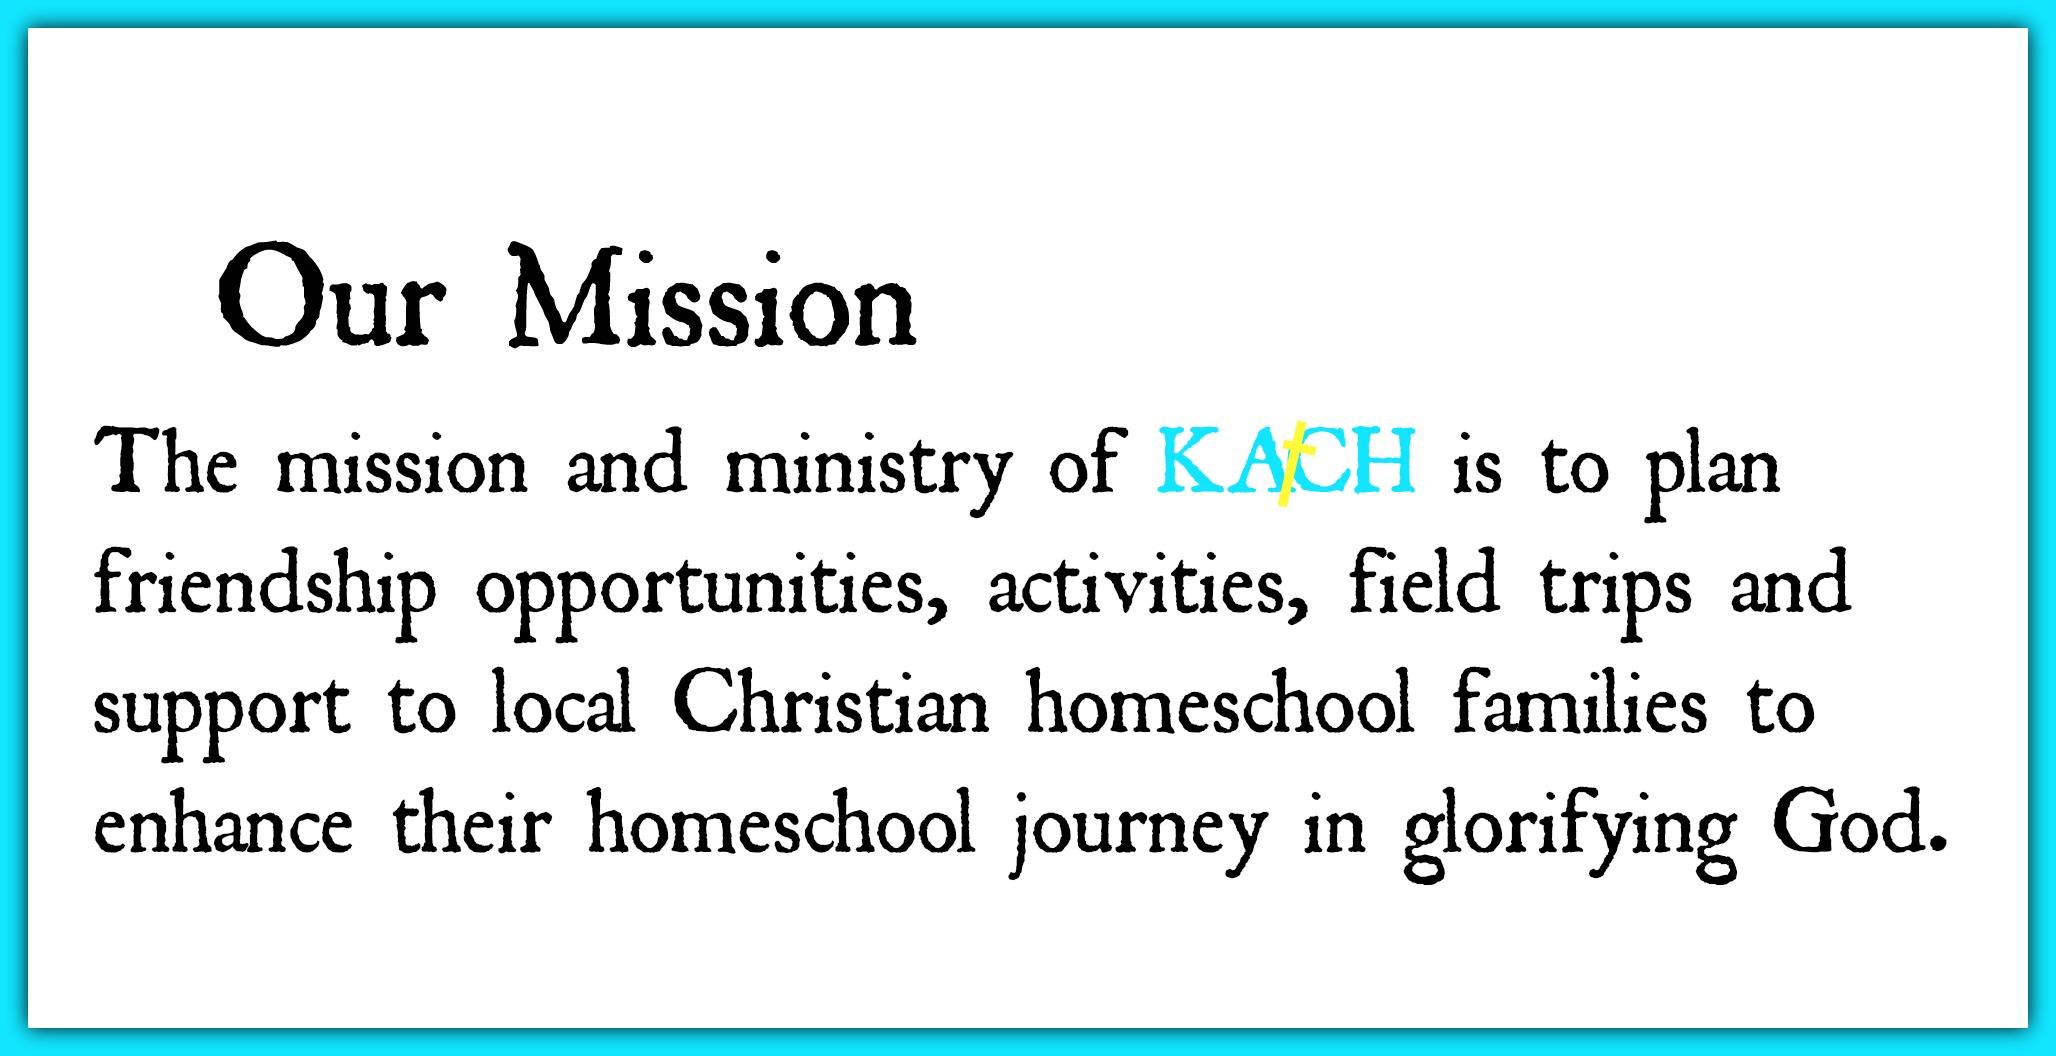 KACH mission